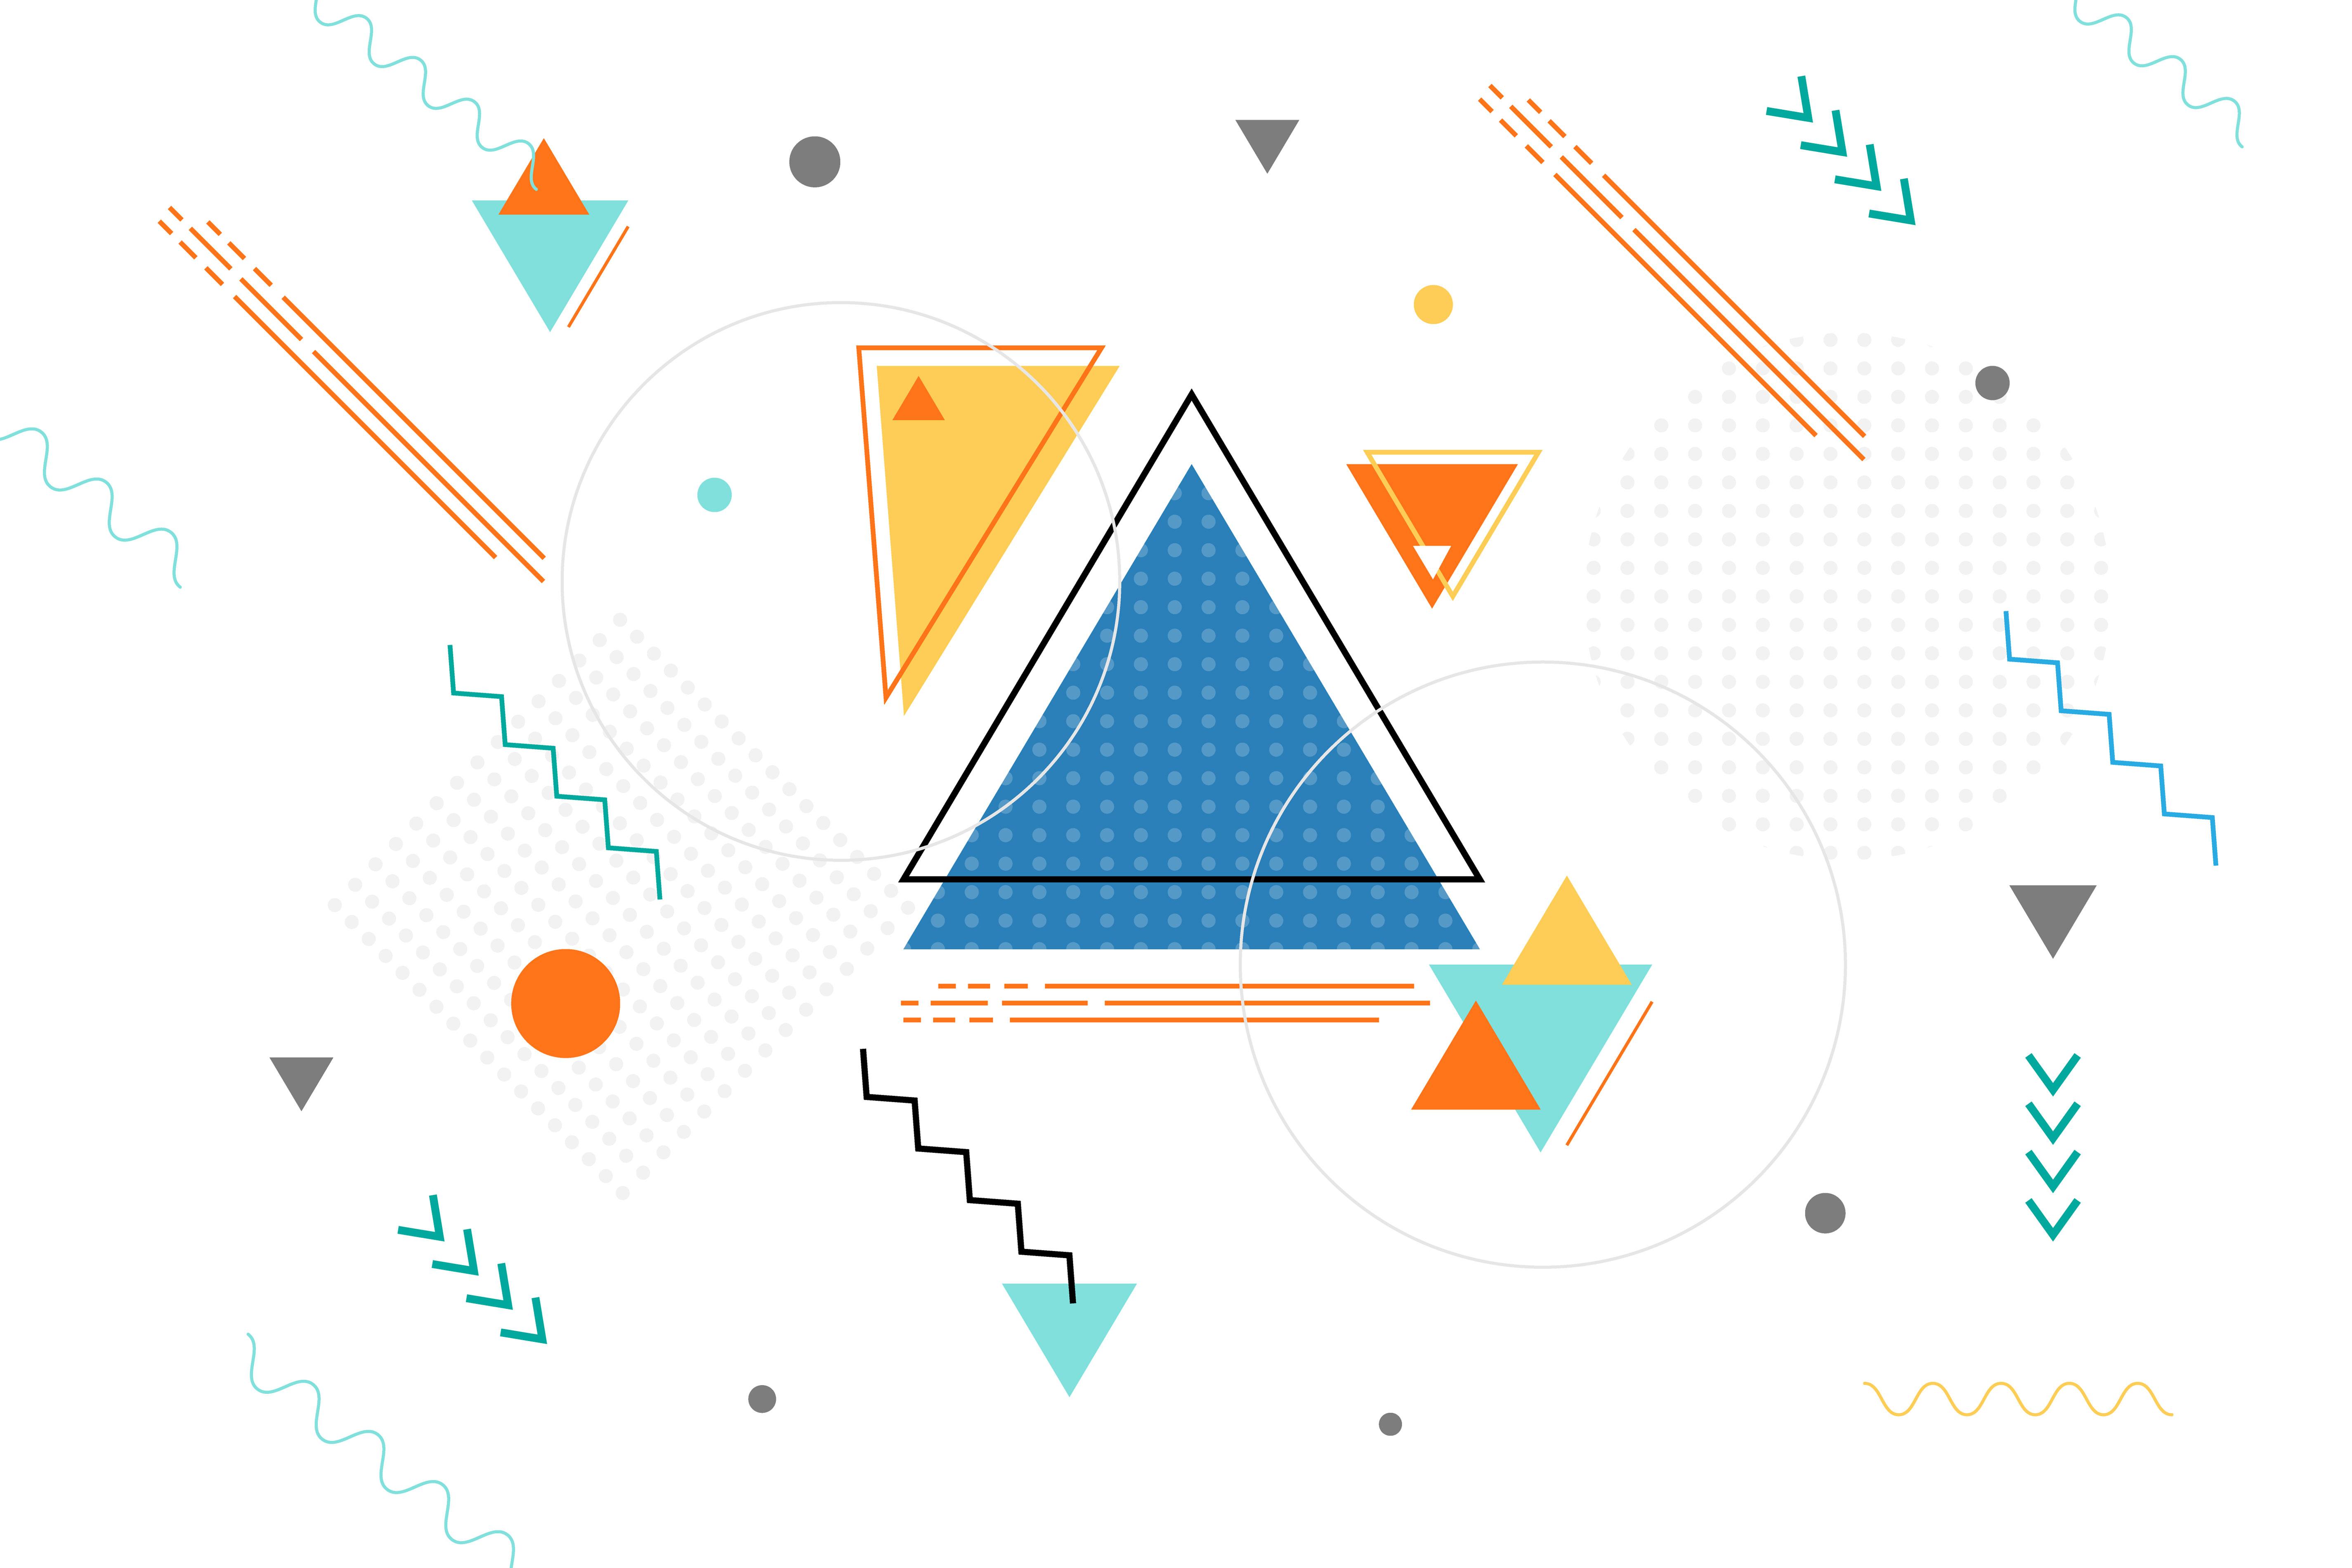 Free Pattern Background Download